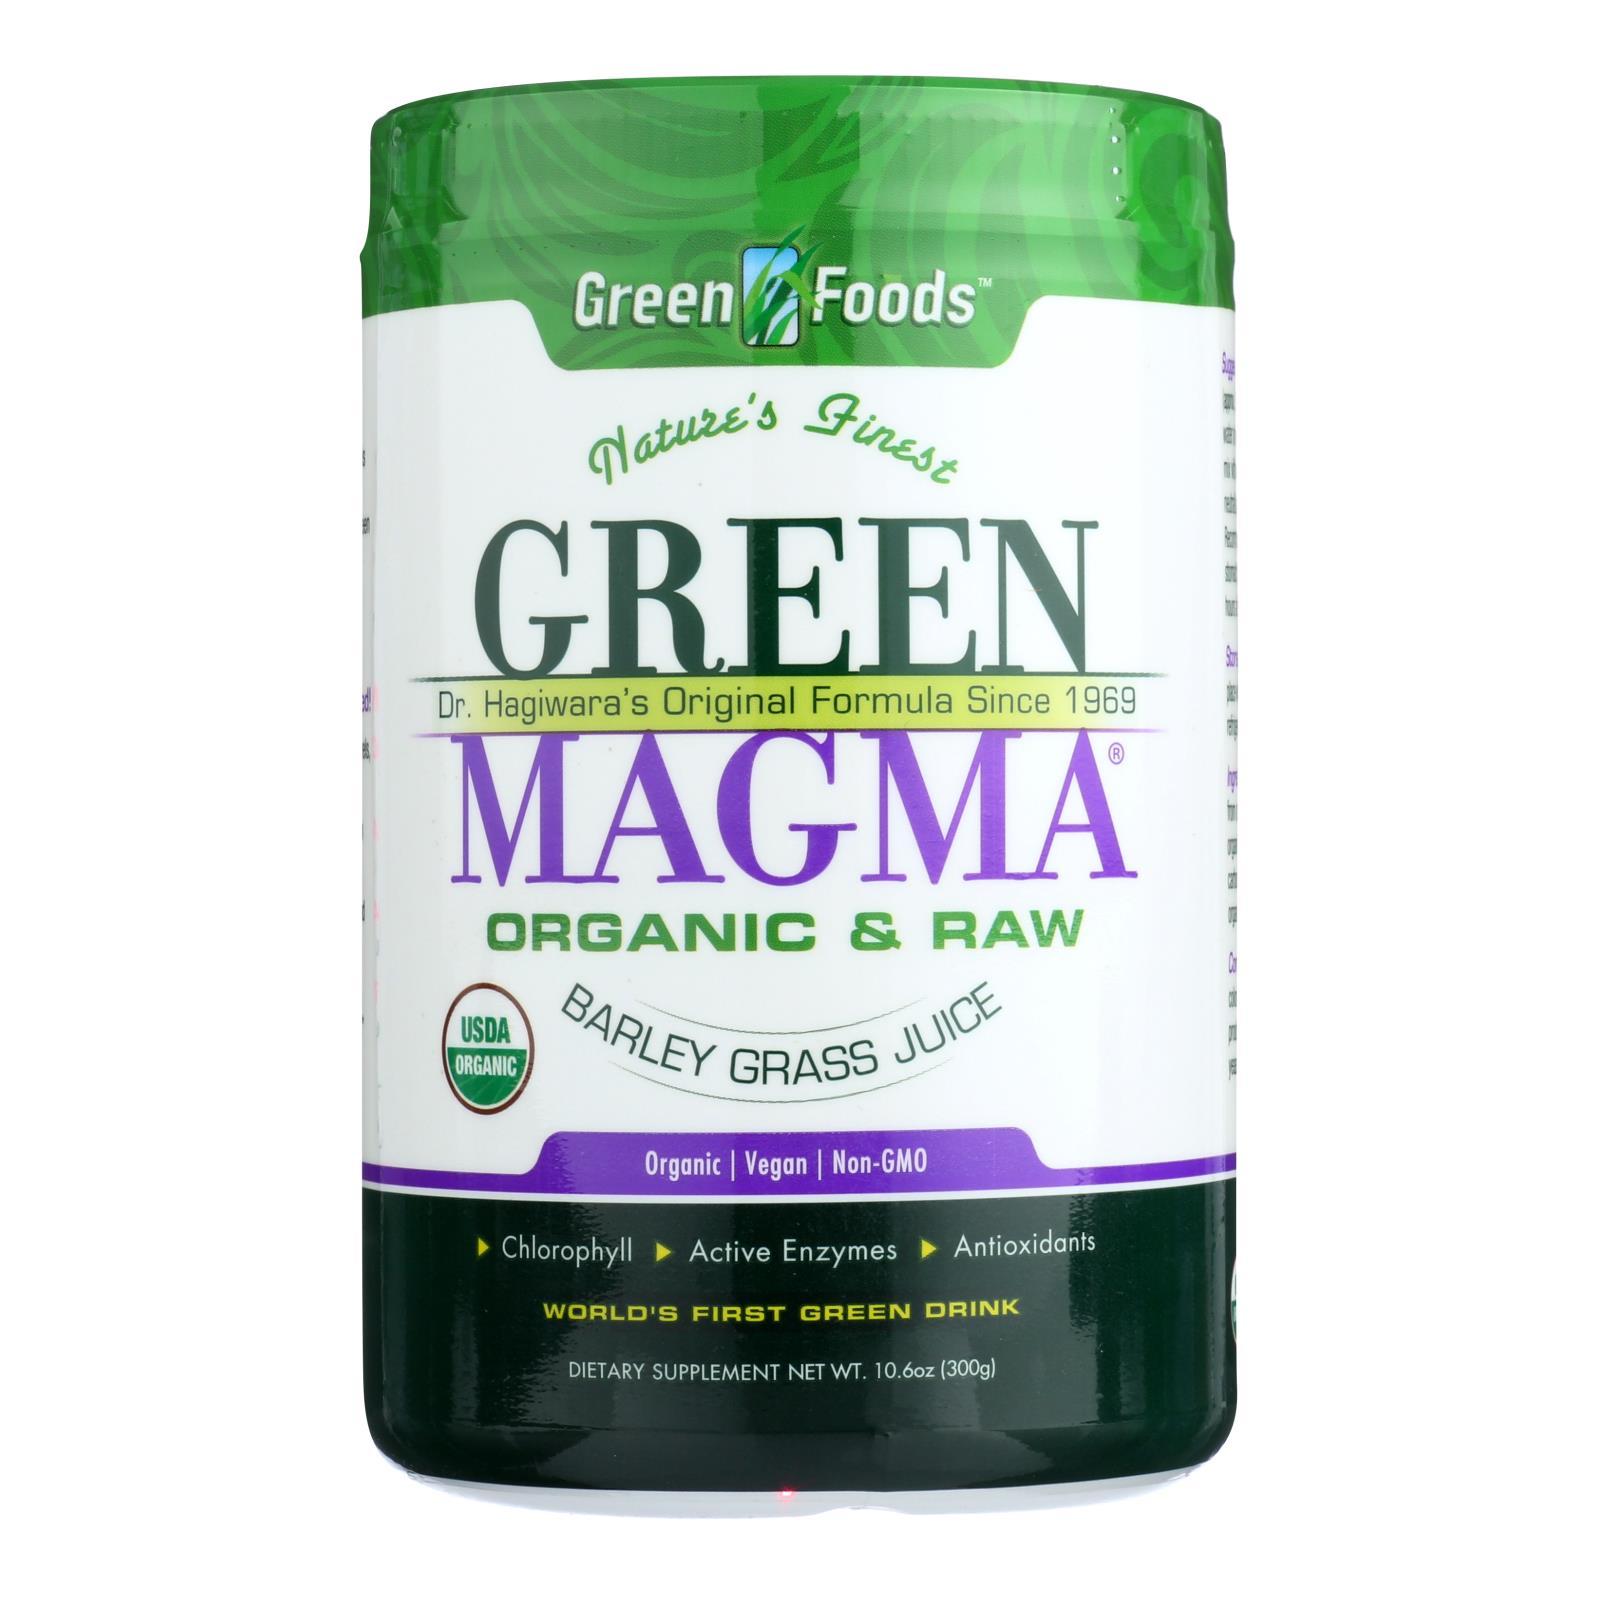 Green Foods Dr Hagiwara Green Magma Barley Grass Juice Powder - 10.6 oz